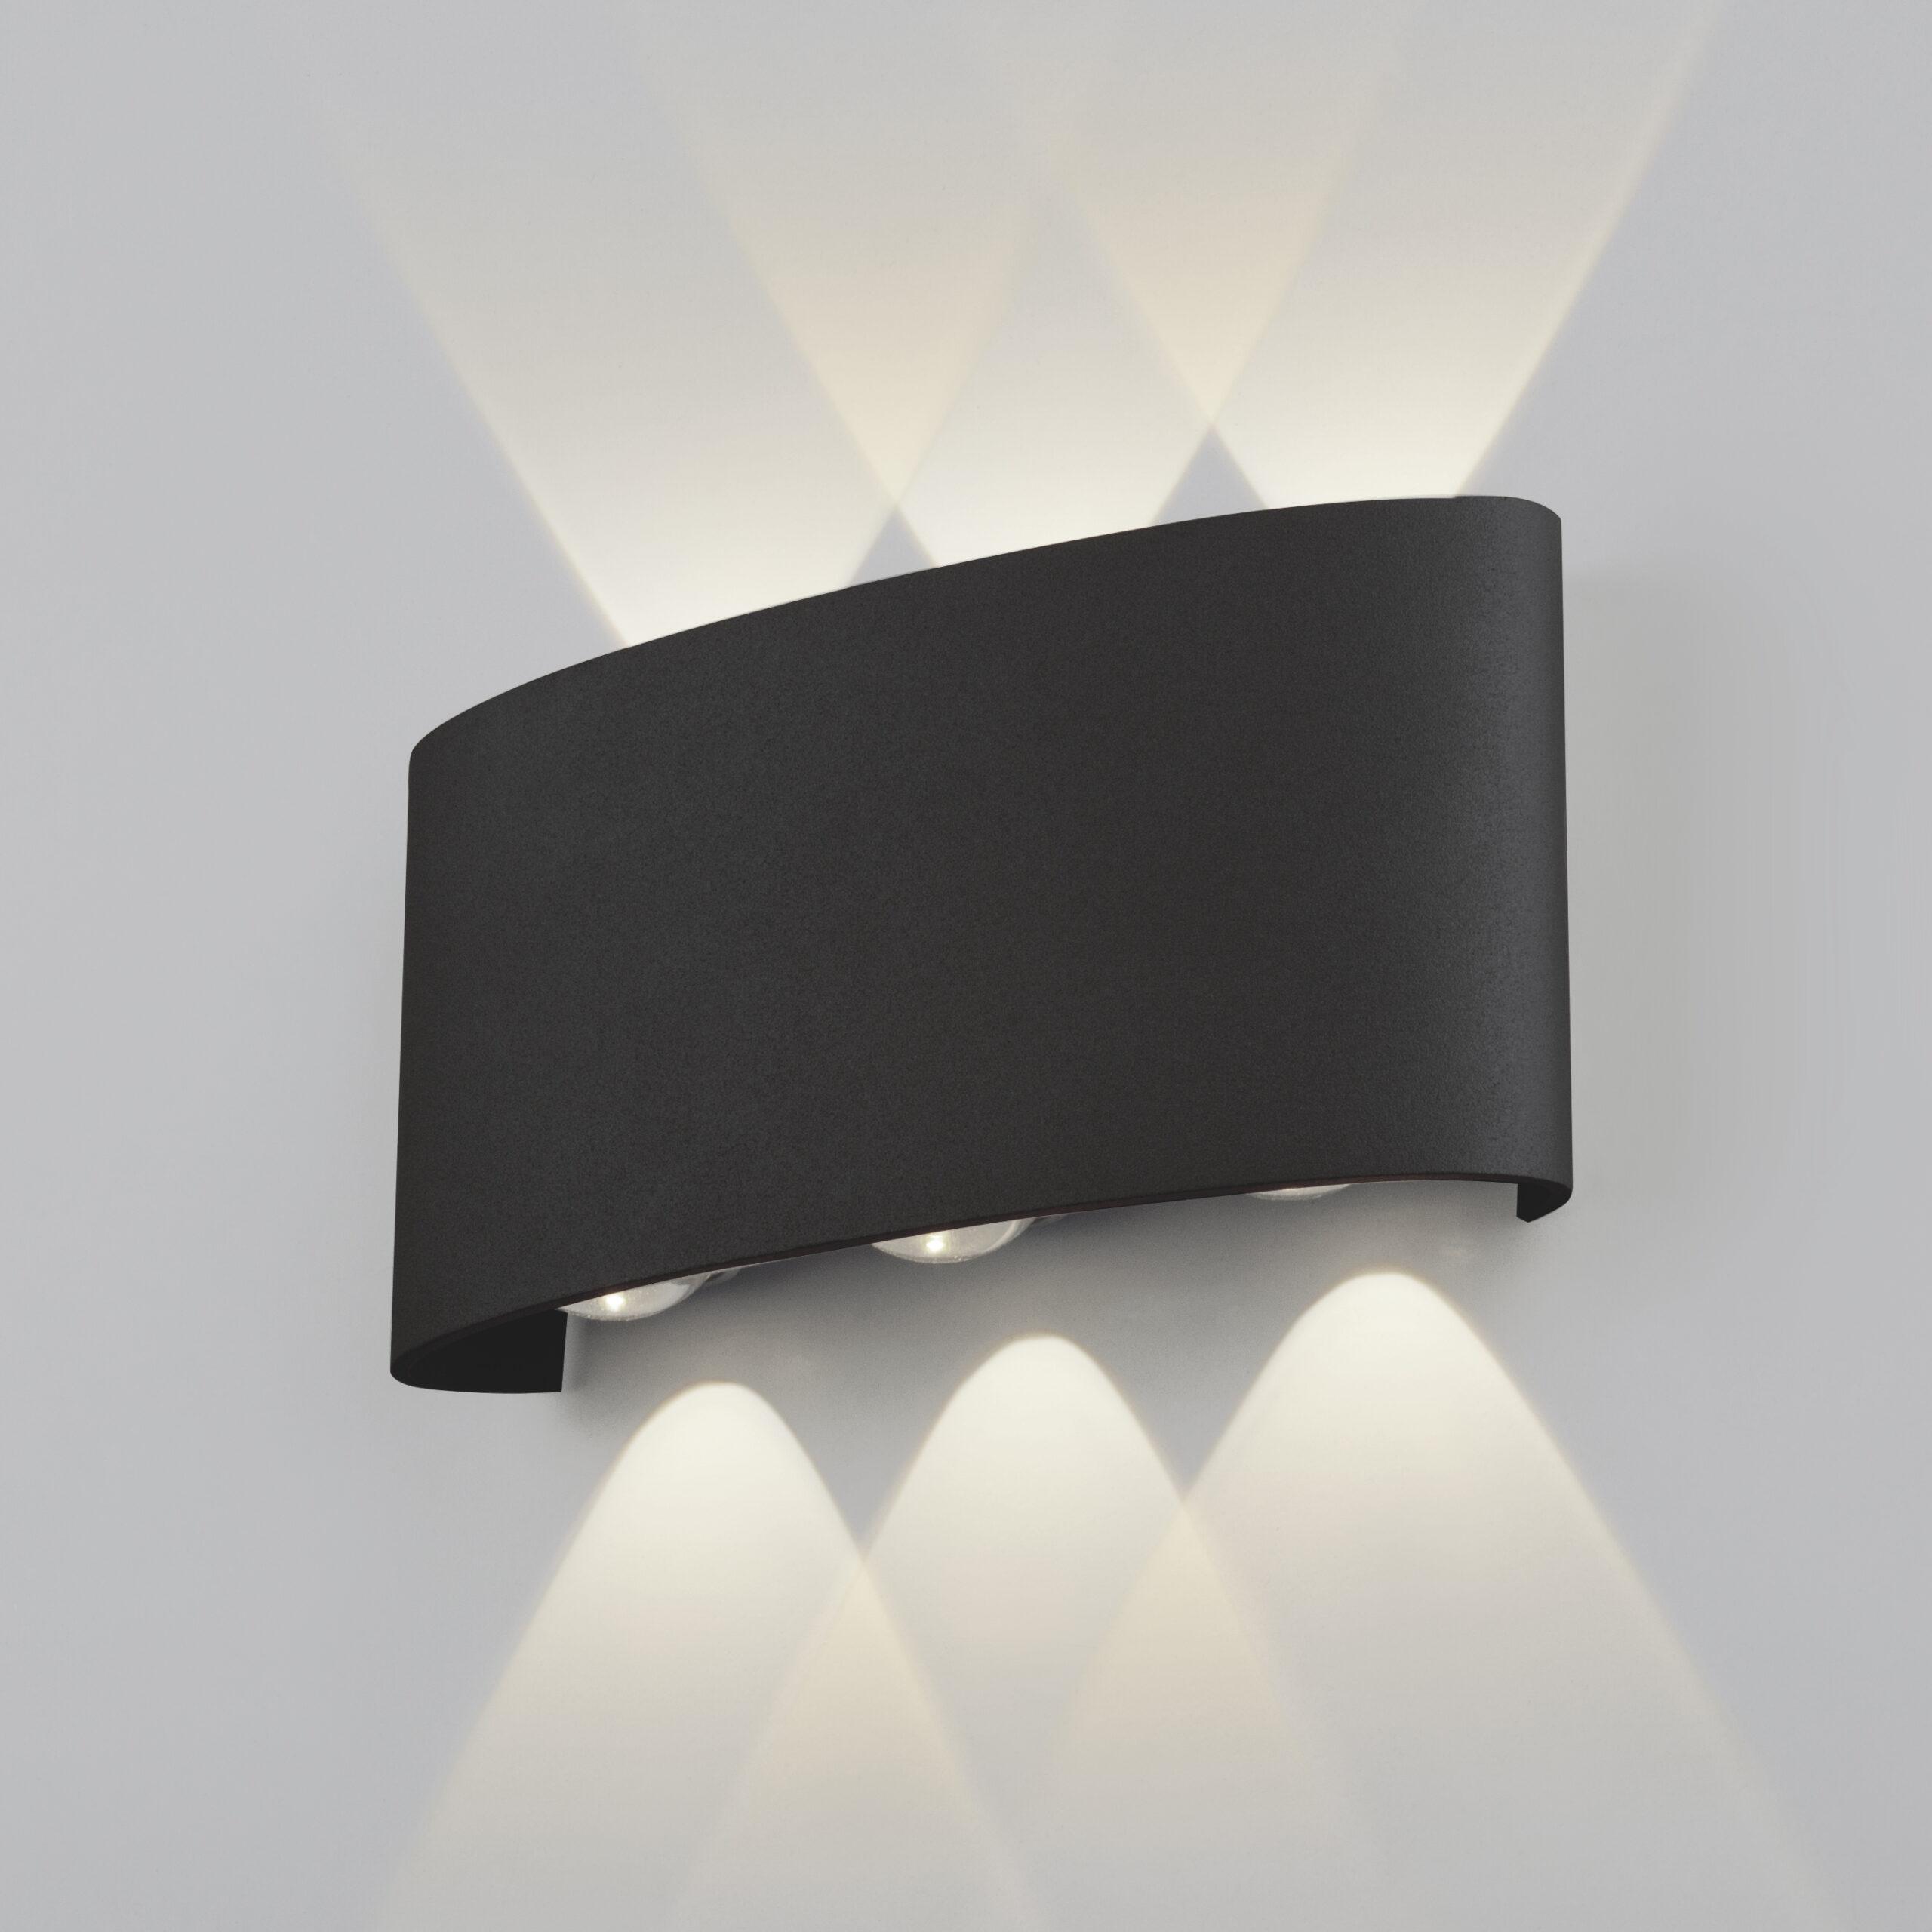 1551 TECHNO LED TWINKY TRIO черный